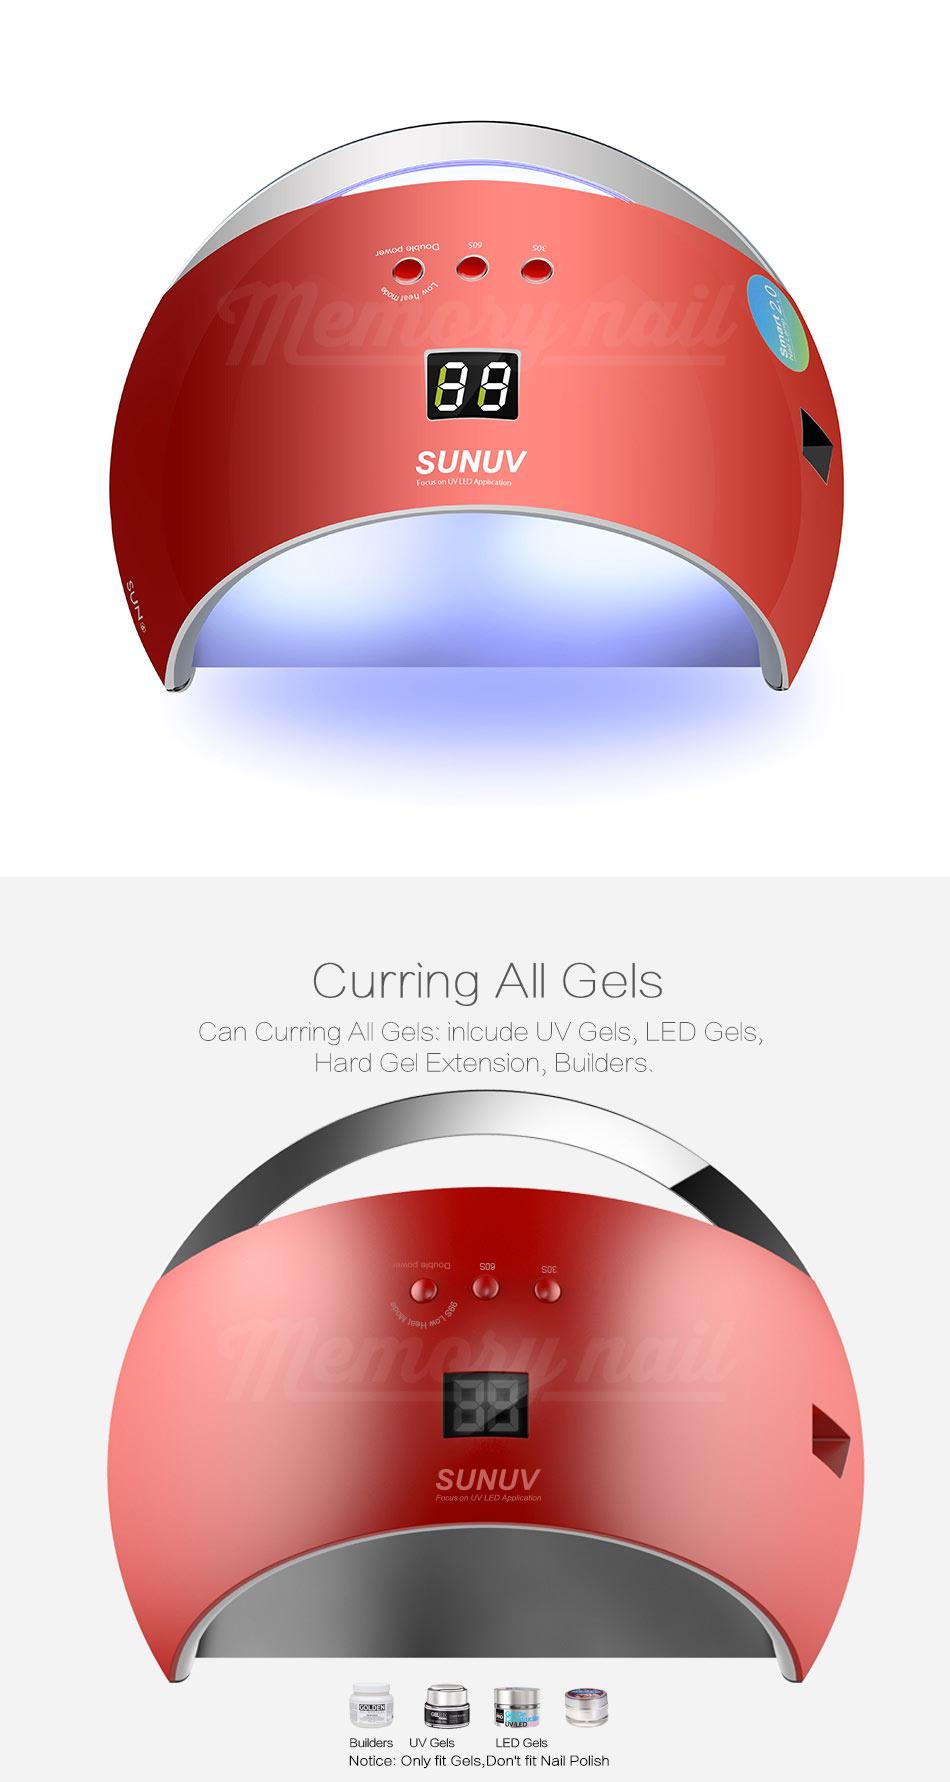 LED SUN 6,LED SUN,เครื่องอบเจล LED SUN 6,เครื่องอบเจล LED SUN,เครื่องอบเจล,เครื่องอบสีเจล